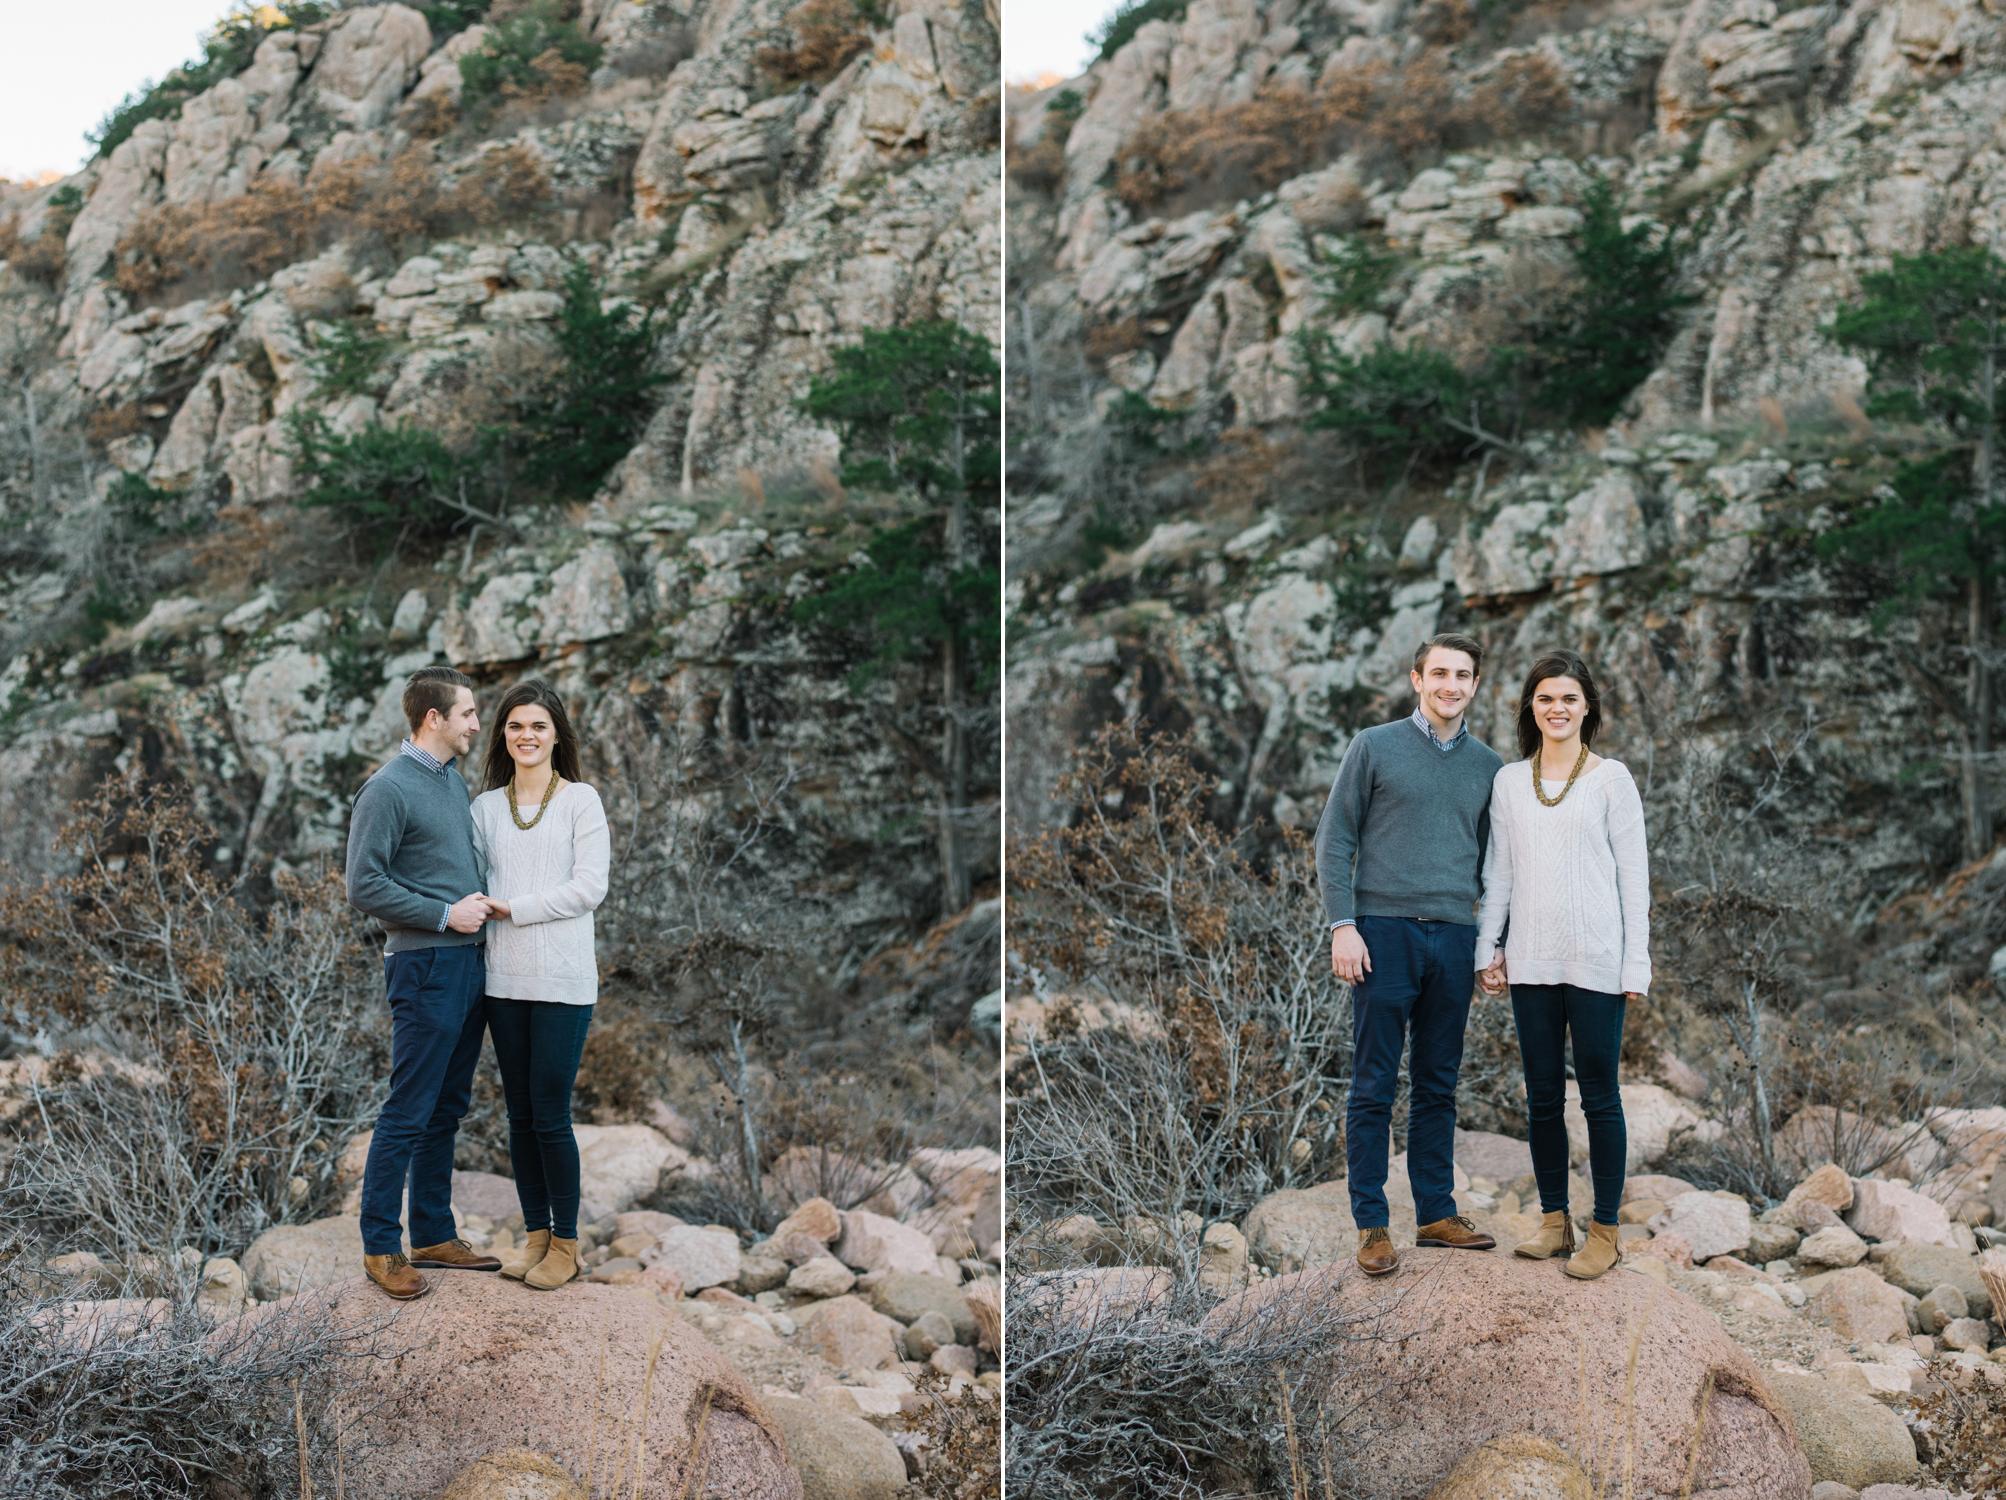 Wichita Kansas Engagement Photographer-Oklahoma Photographer-Wichita Mountains-Neal Dieker-102.jpg